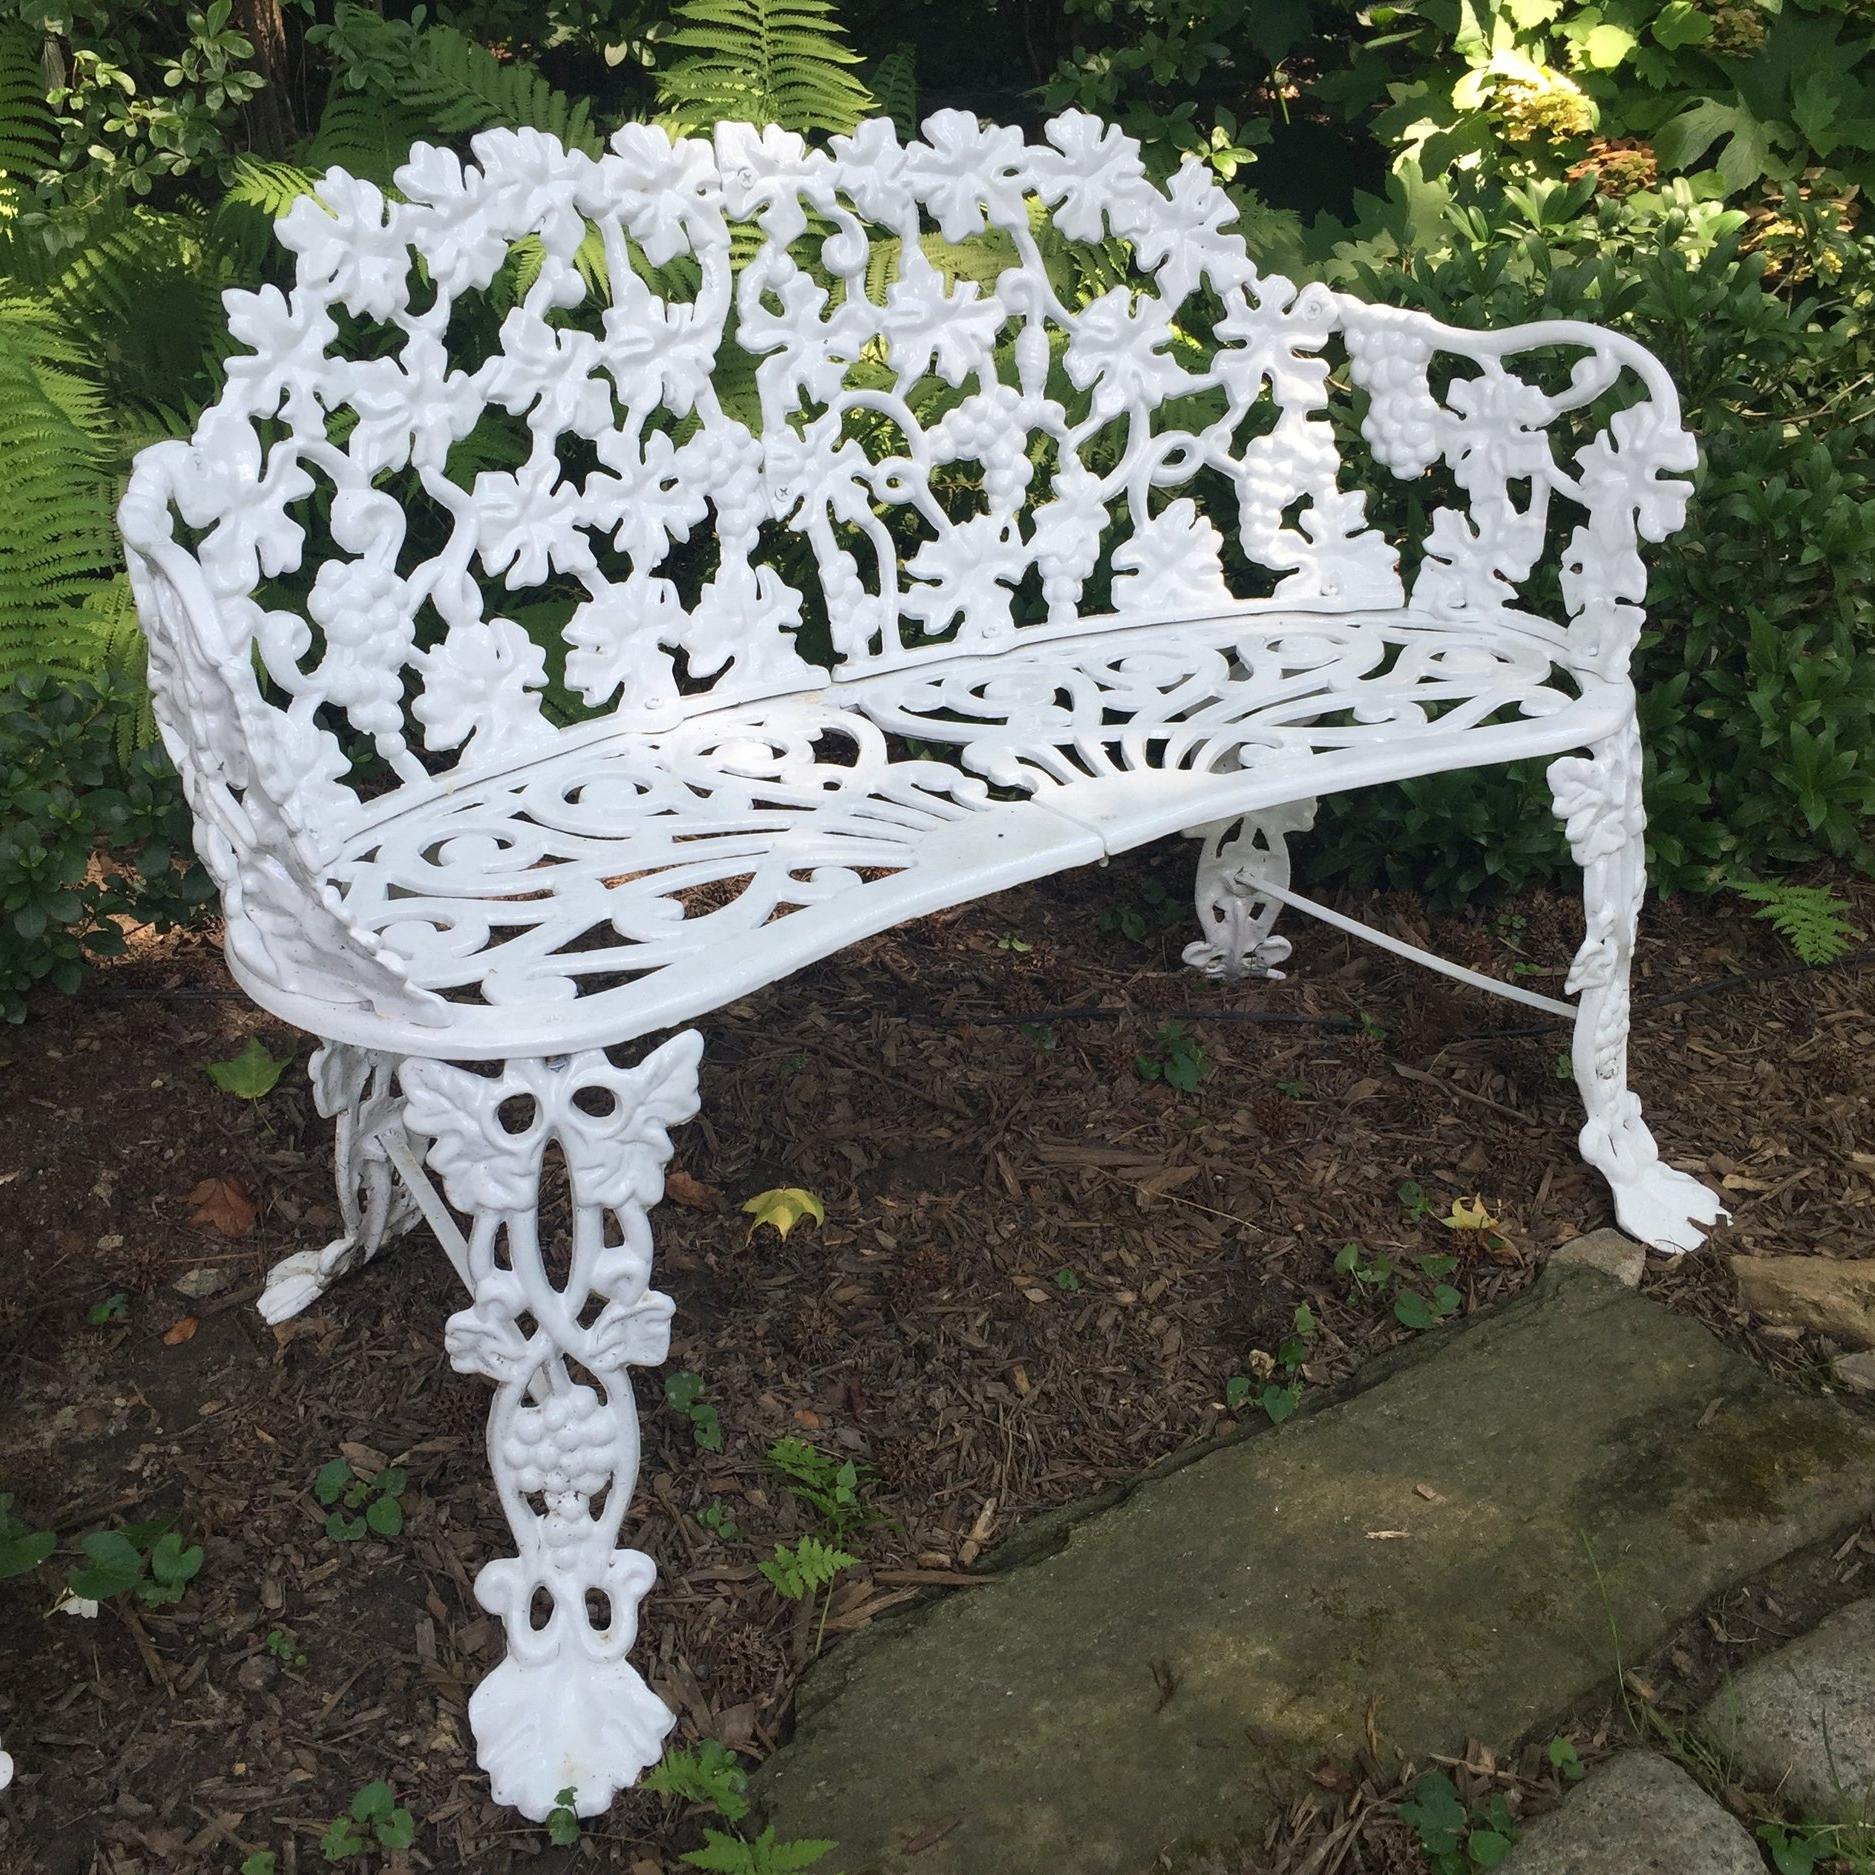 In situ ornamental garden furniture following conservation treatment.